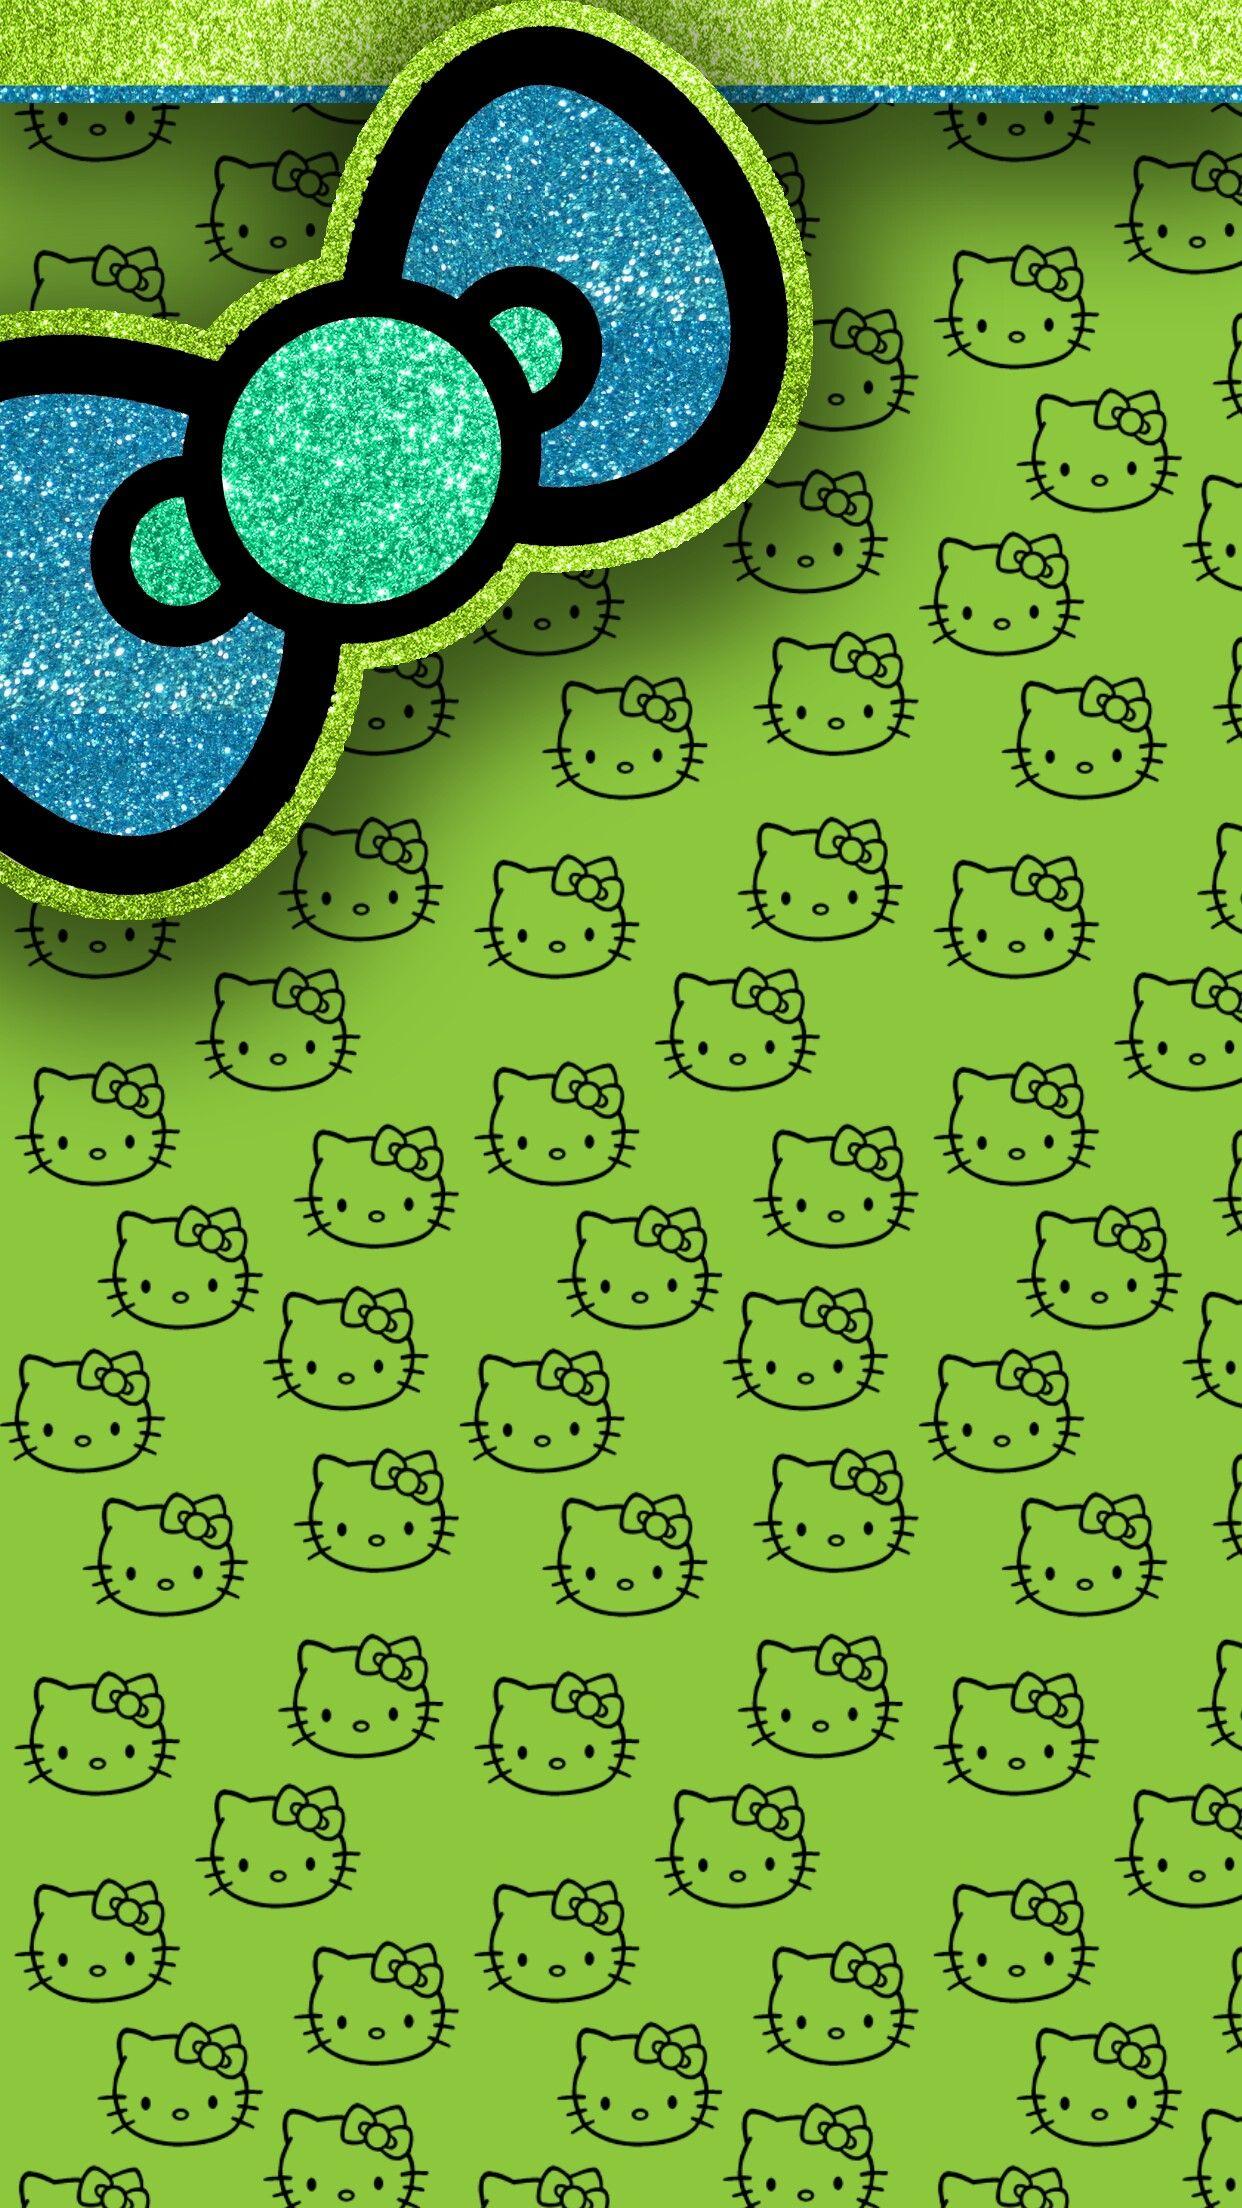 Good Wallpaper Hello Kitty Turquoise - 4141cfccb617eb2f871205c3c3e0fbcb  Gallery_92669.jpg